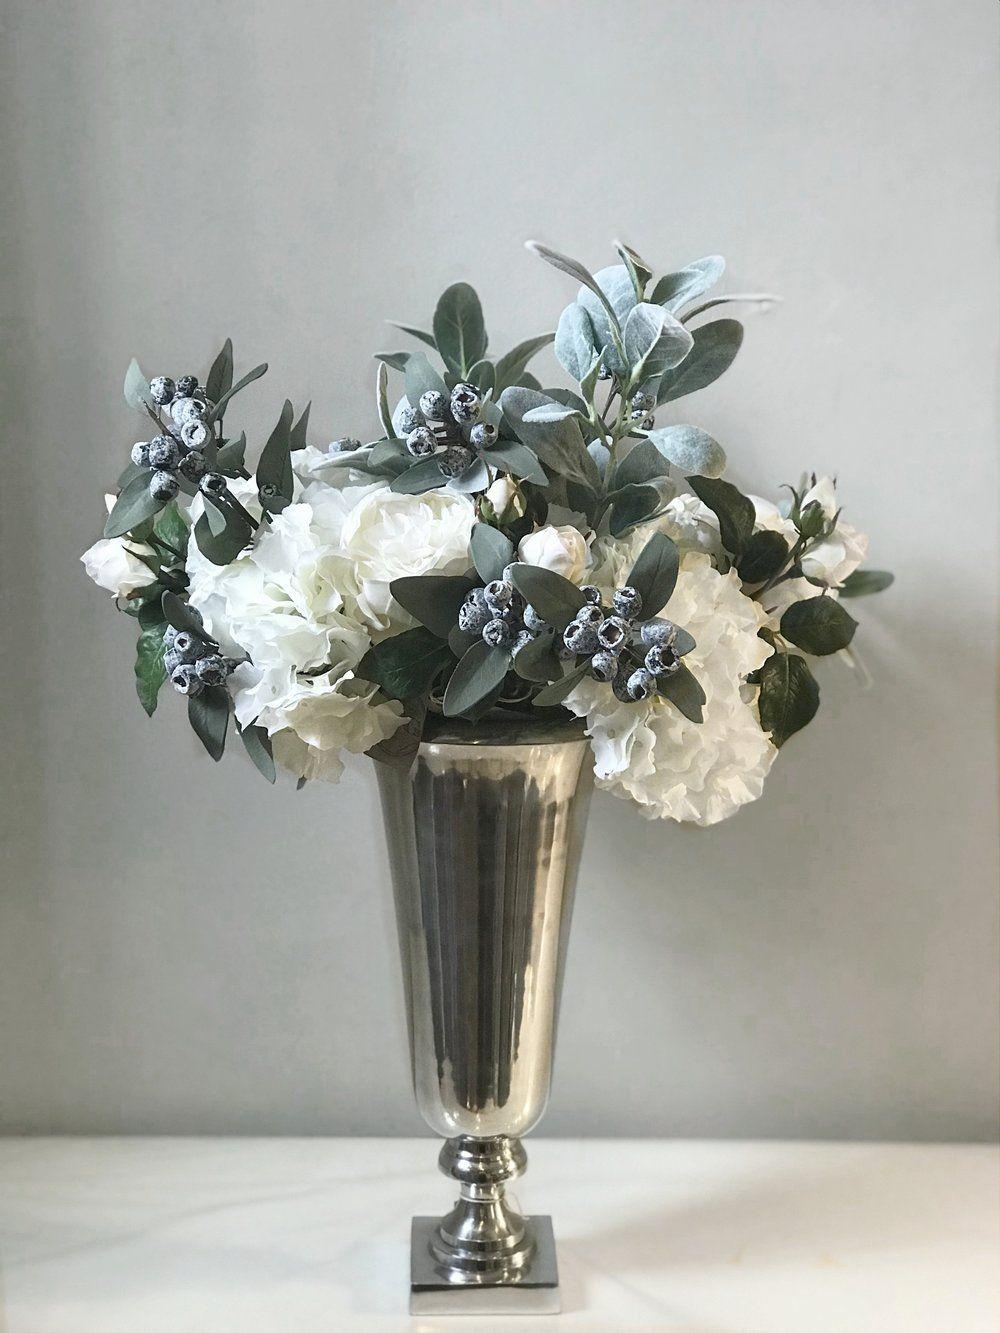 Flower Arrangement Winter flower arrangements, Flower